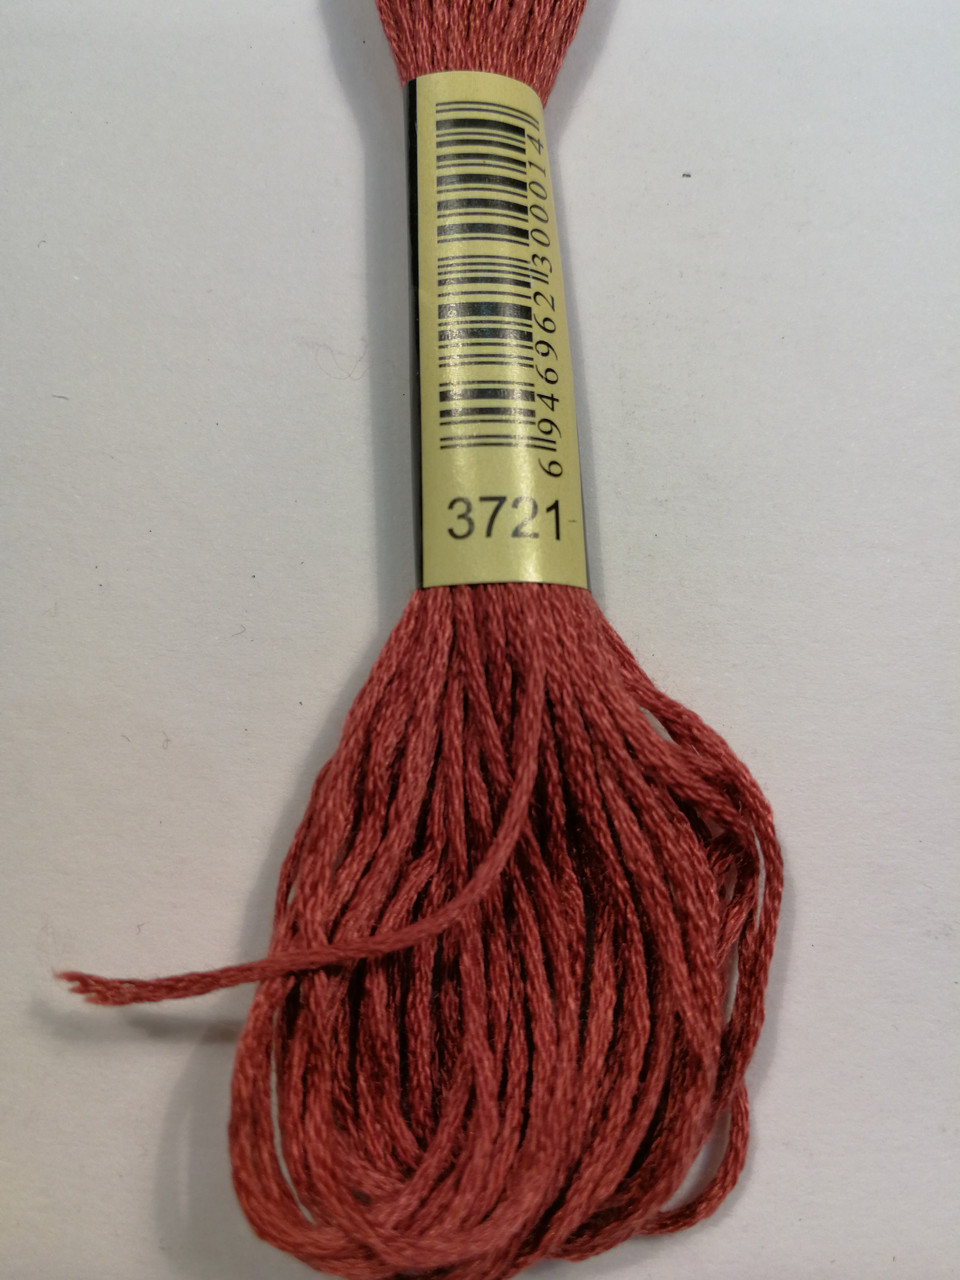 Мулине СХС 3721 розовые ракушки темный